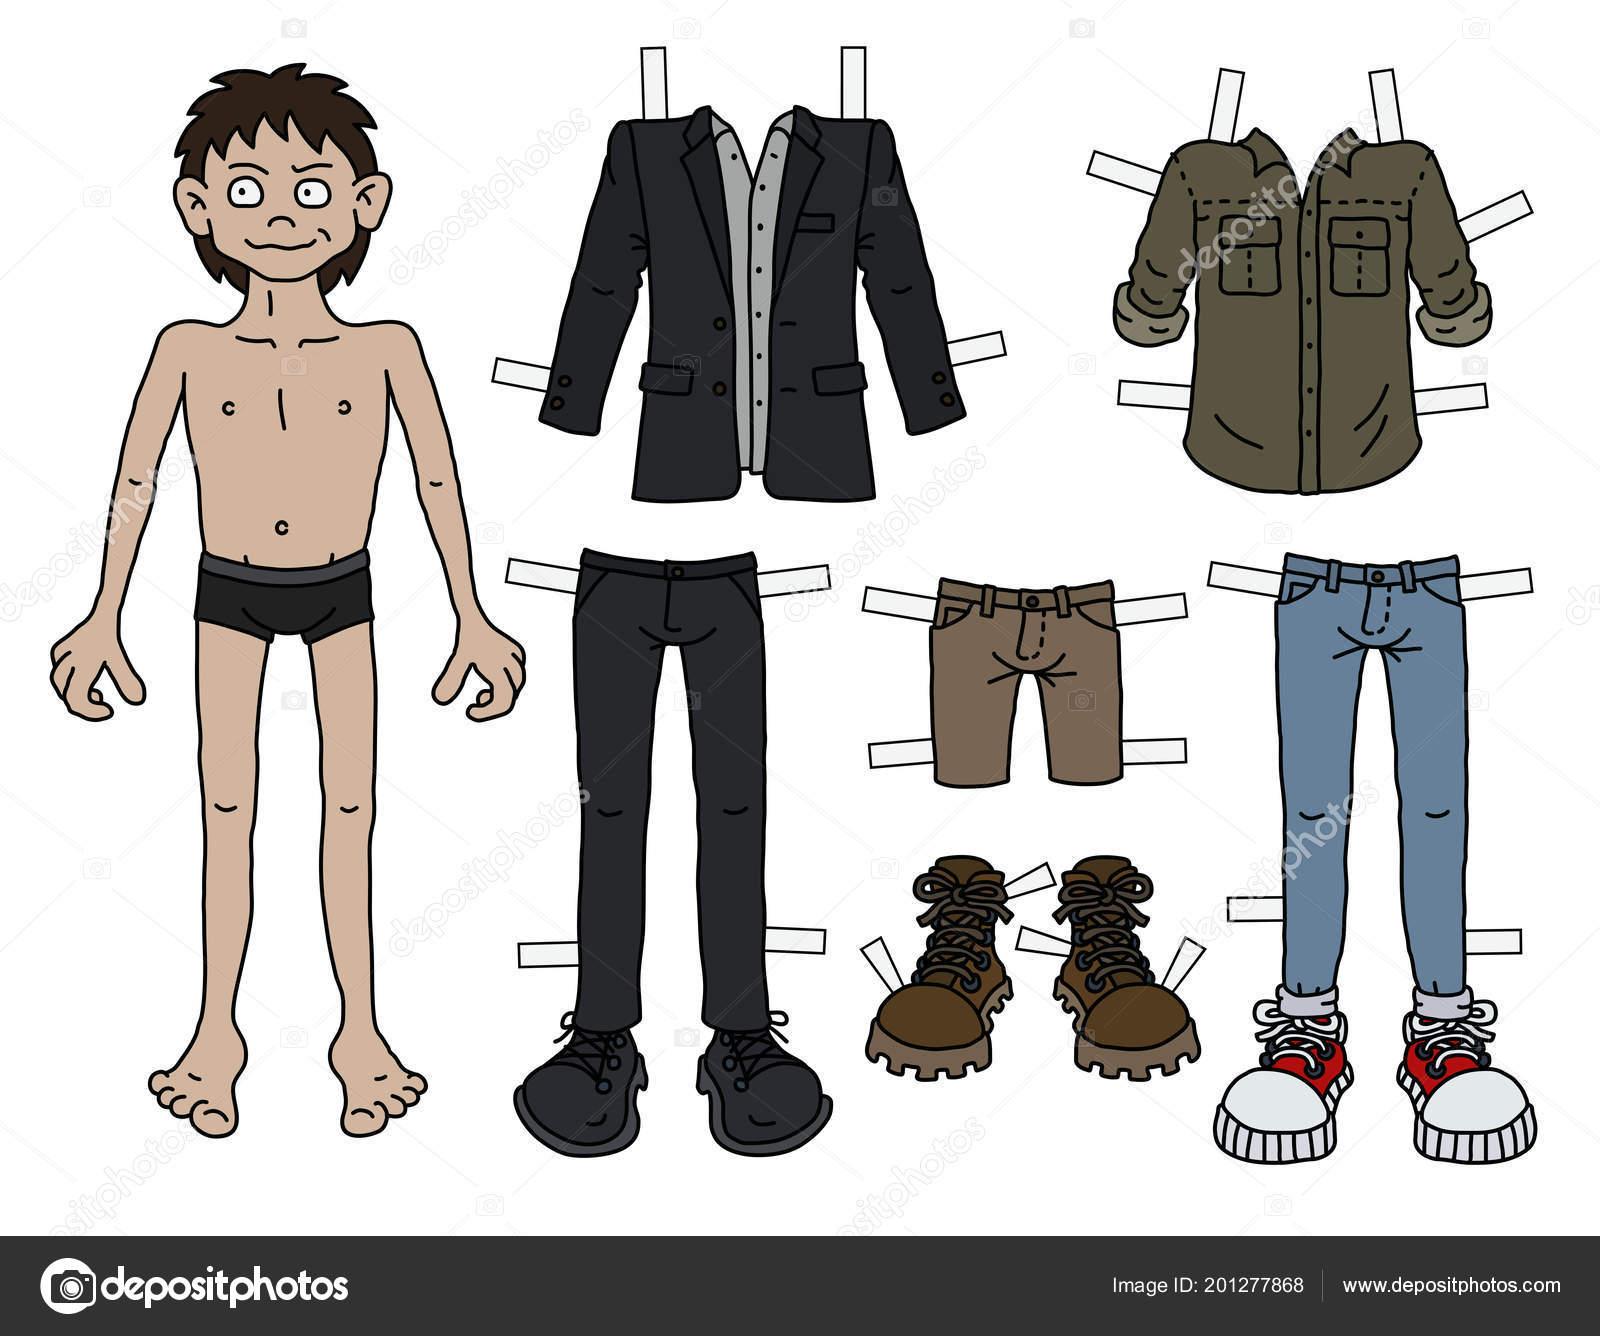 Paper Doll Funny Boy Cutout Clothes Stockvektor